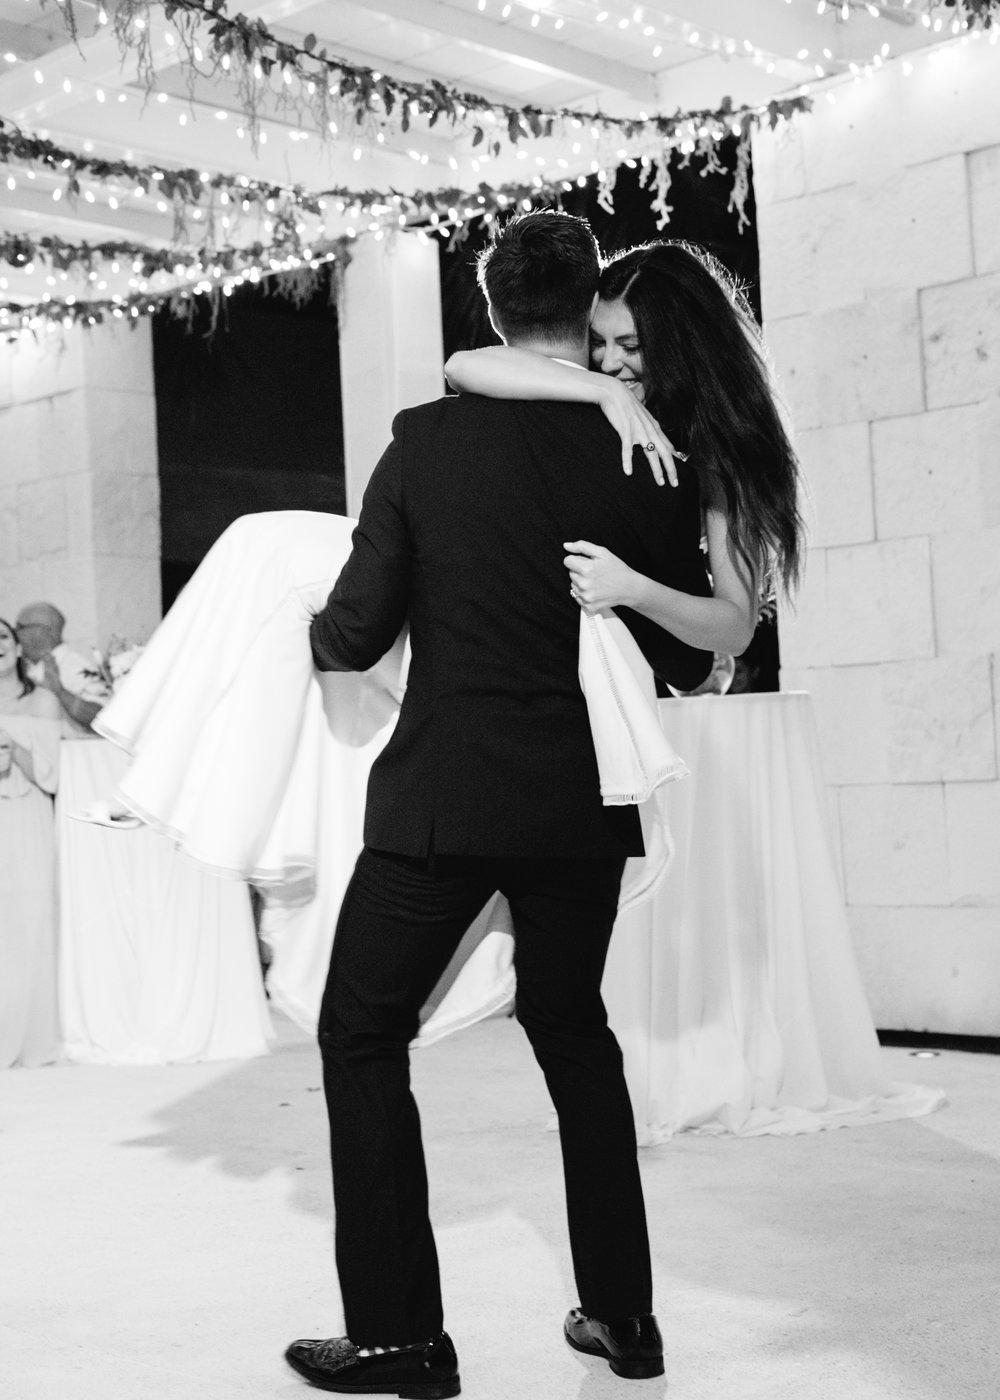 Kyle John l Fine Art Wedding Photography l Chicago, Copenhagen, California, New York, Destination l Blog l Brooke Boyd_The Film Poets_Tulum Wedding_43